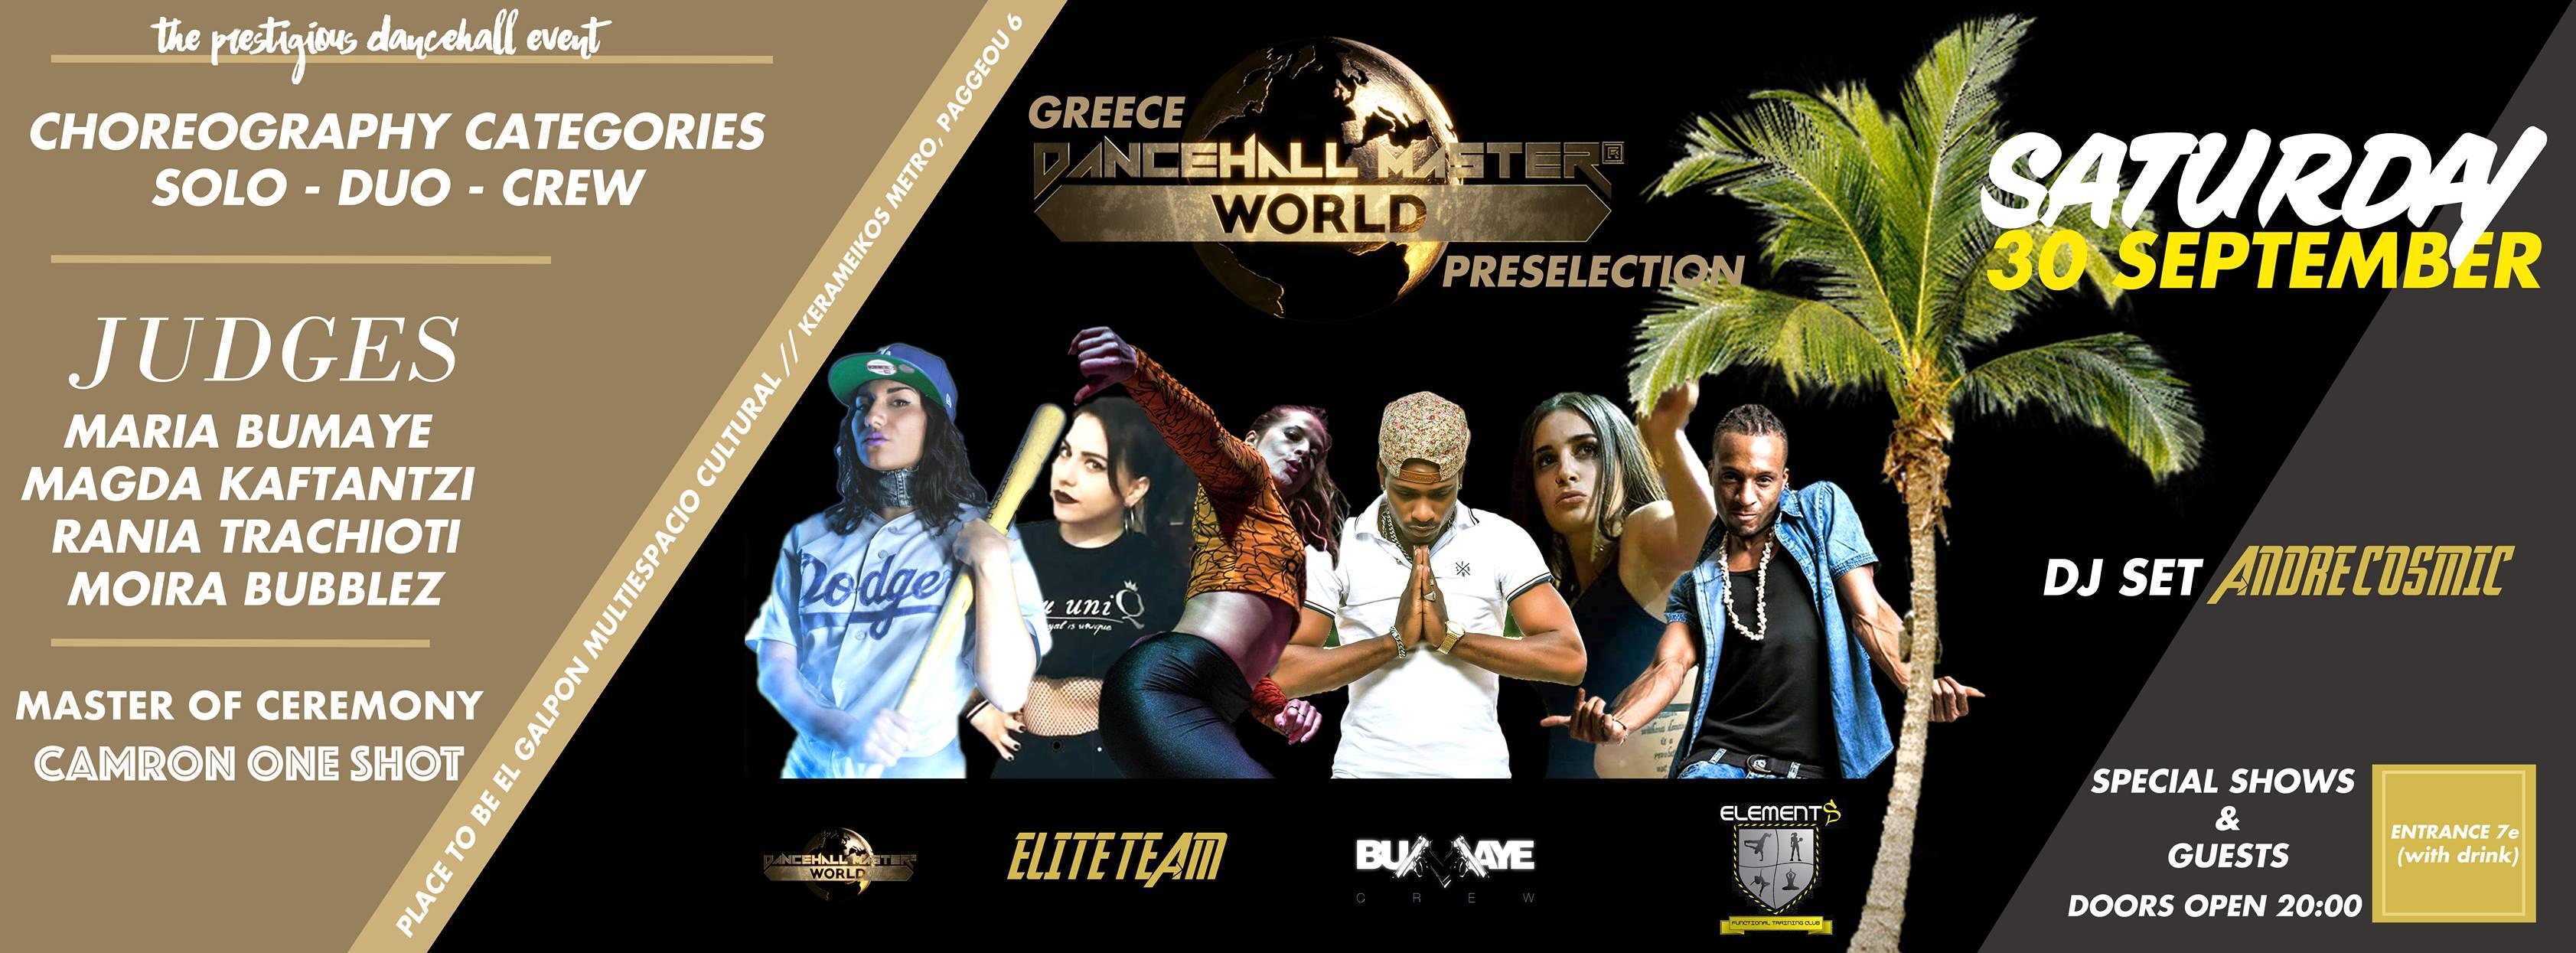 dancehall master world greece